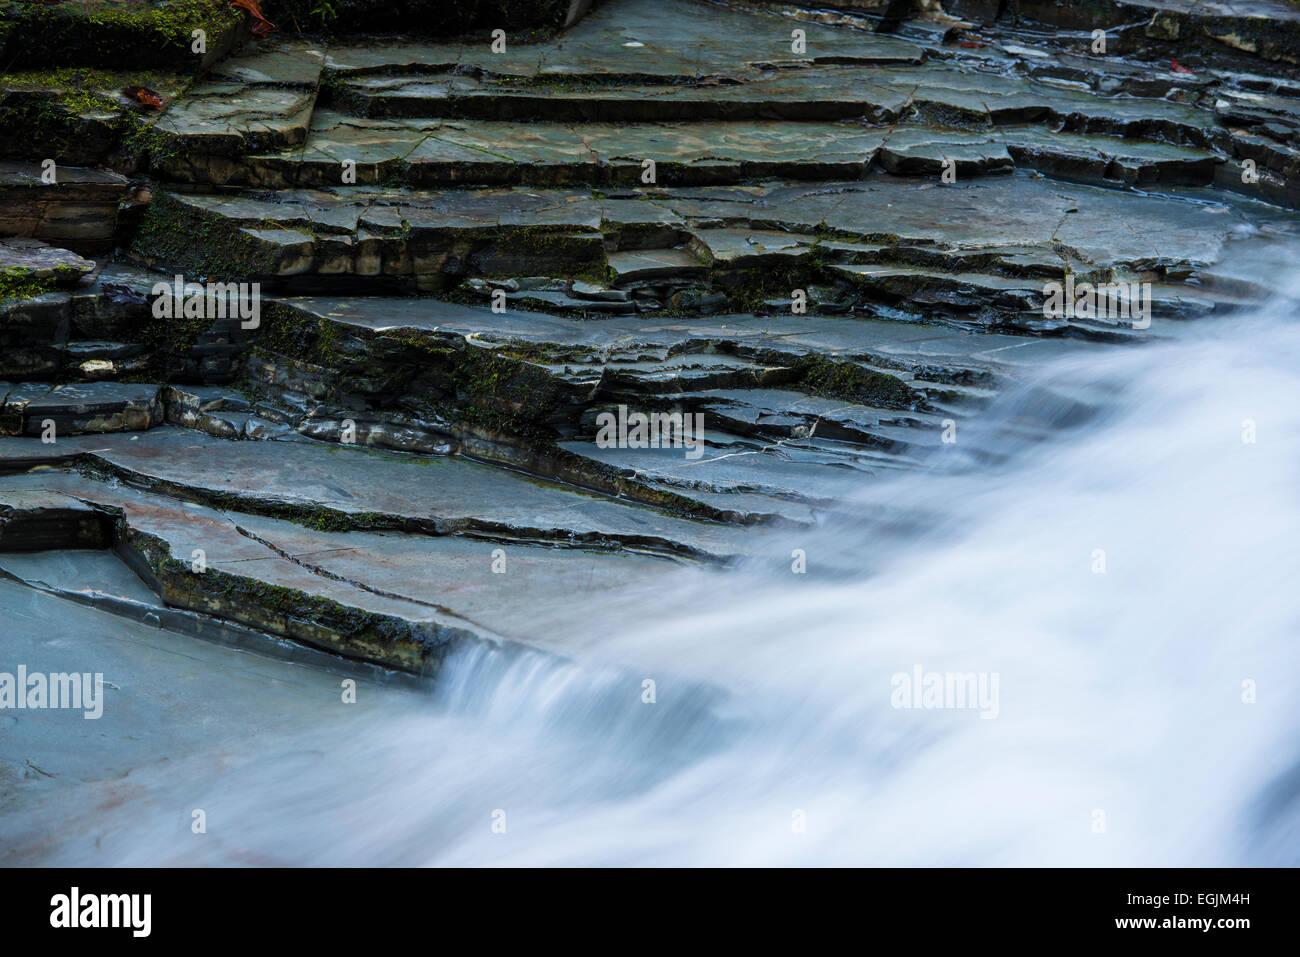 Detail of Taugl stream, Tauglbach or Taugl River, Taugl River Gorge, Tennengau region, Salzburg State, Austria Stock Photo